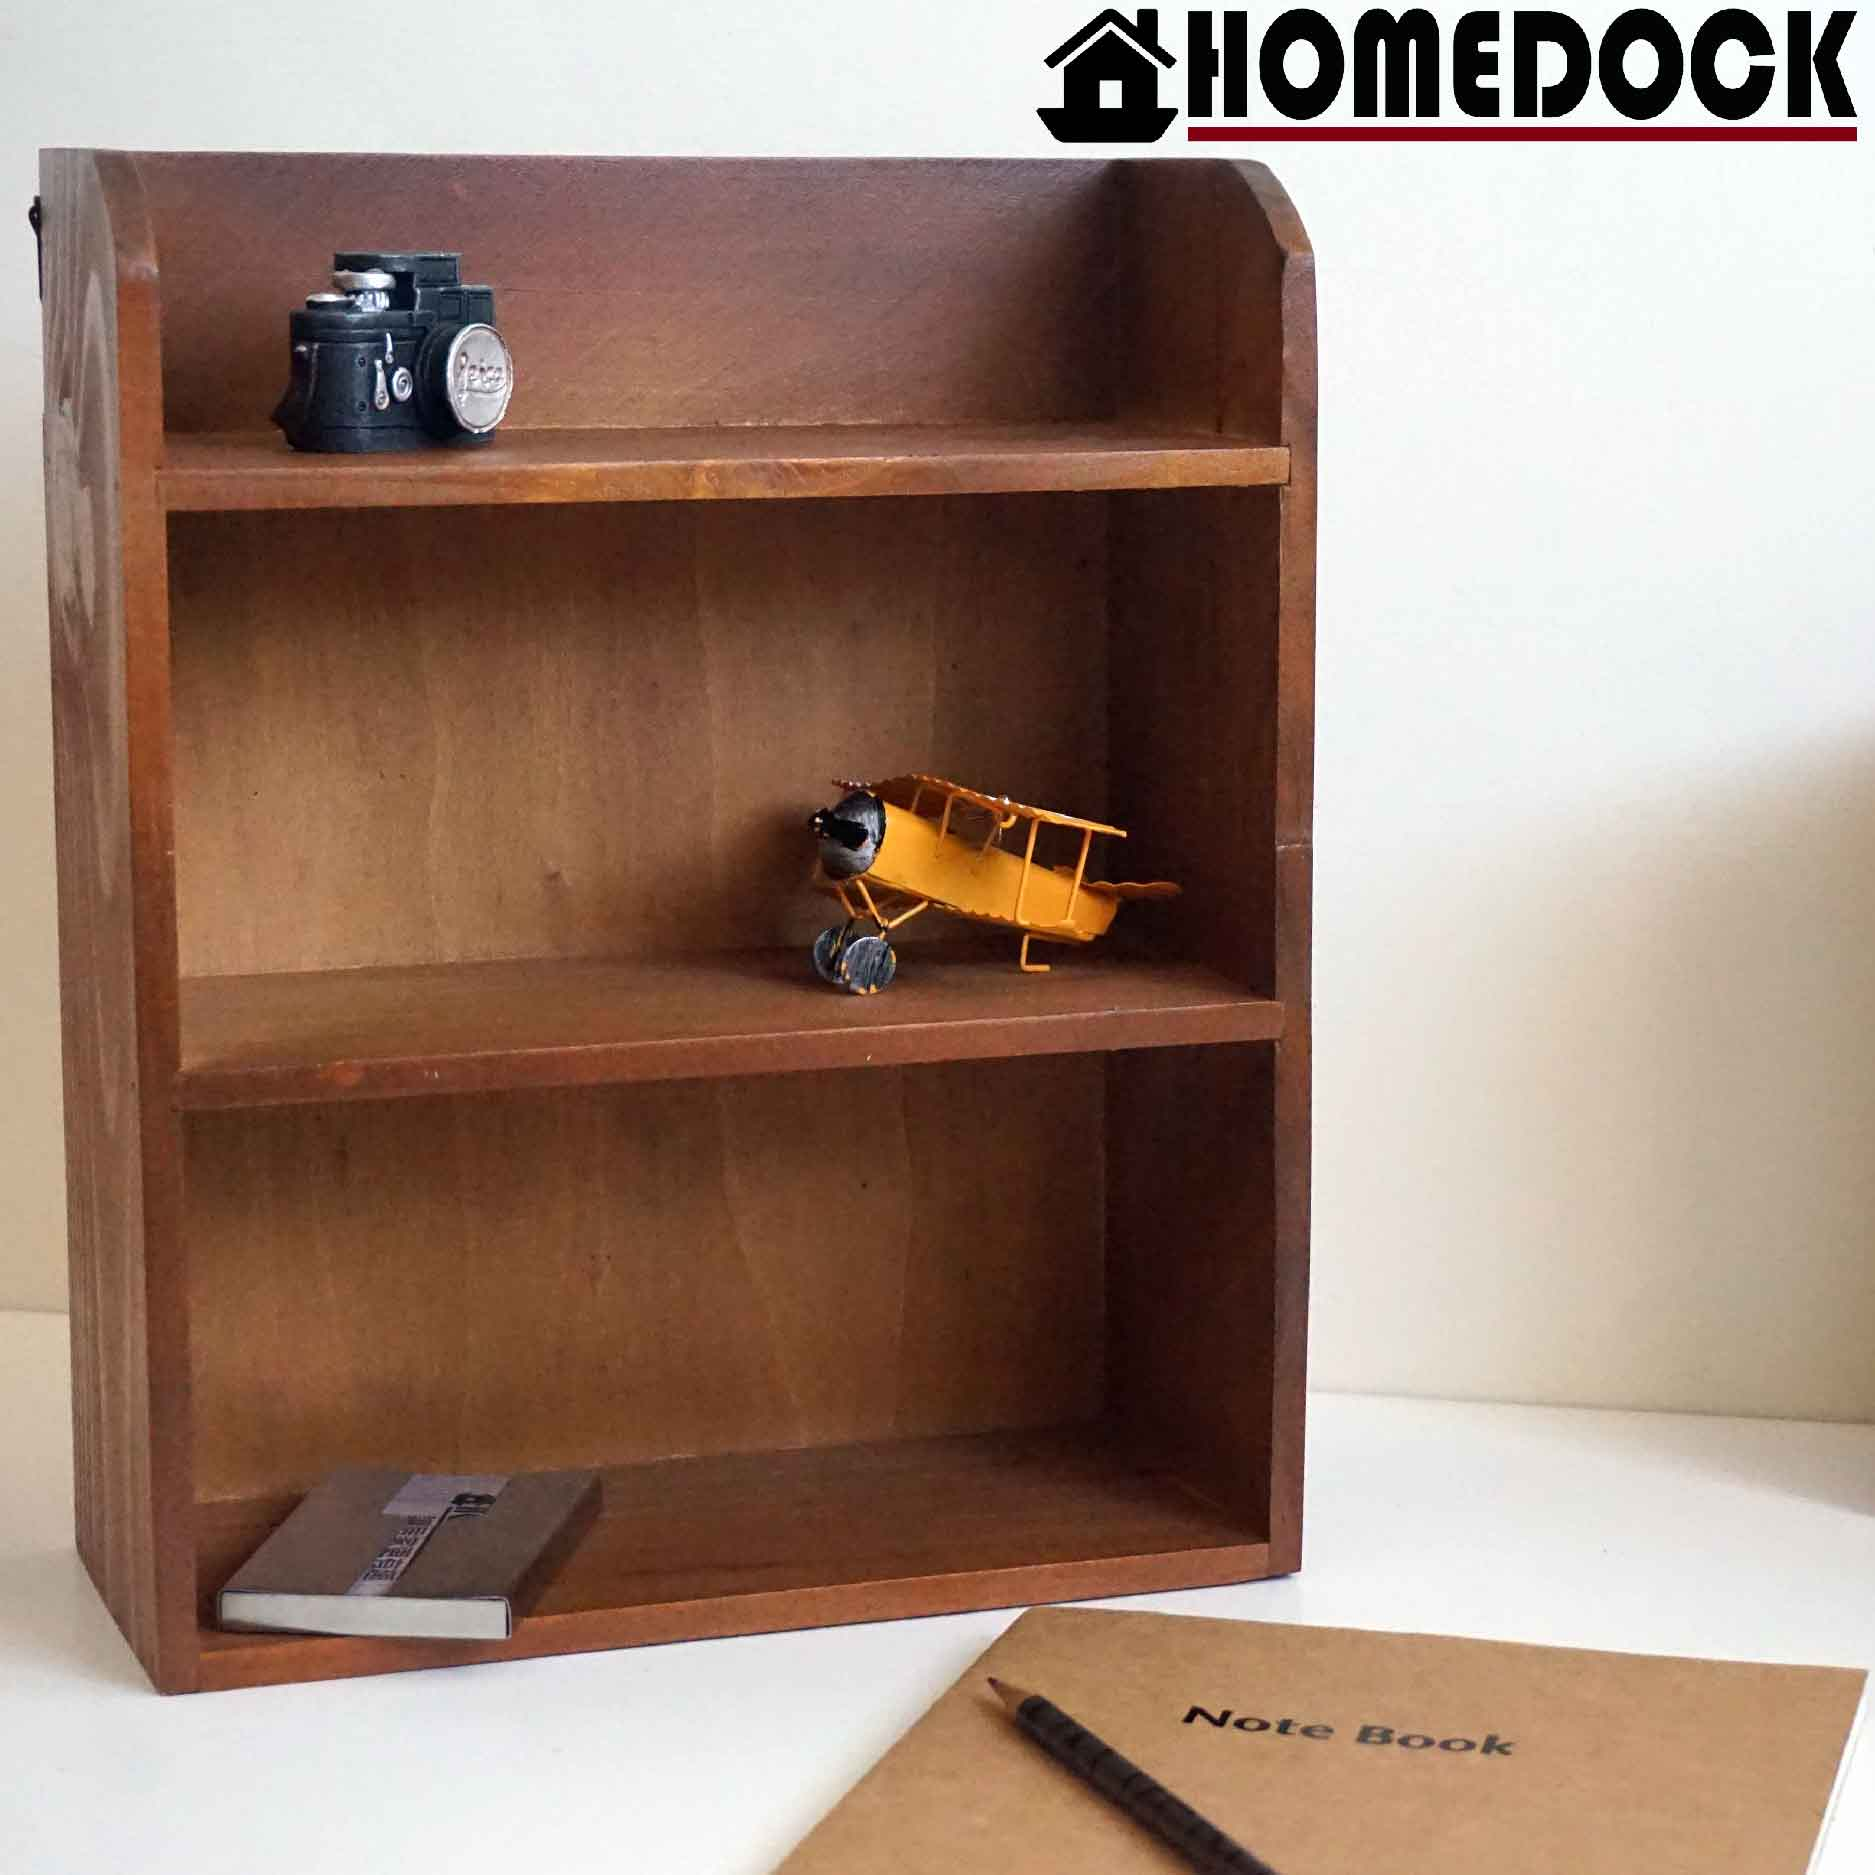 HOMEDOCK-原木質感三層式壁掛收納櫃  壁櫃/展示櫃/杯架/收納盒/原木/掛壁/壁掛/牆壁